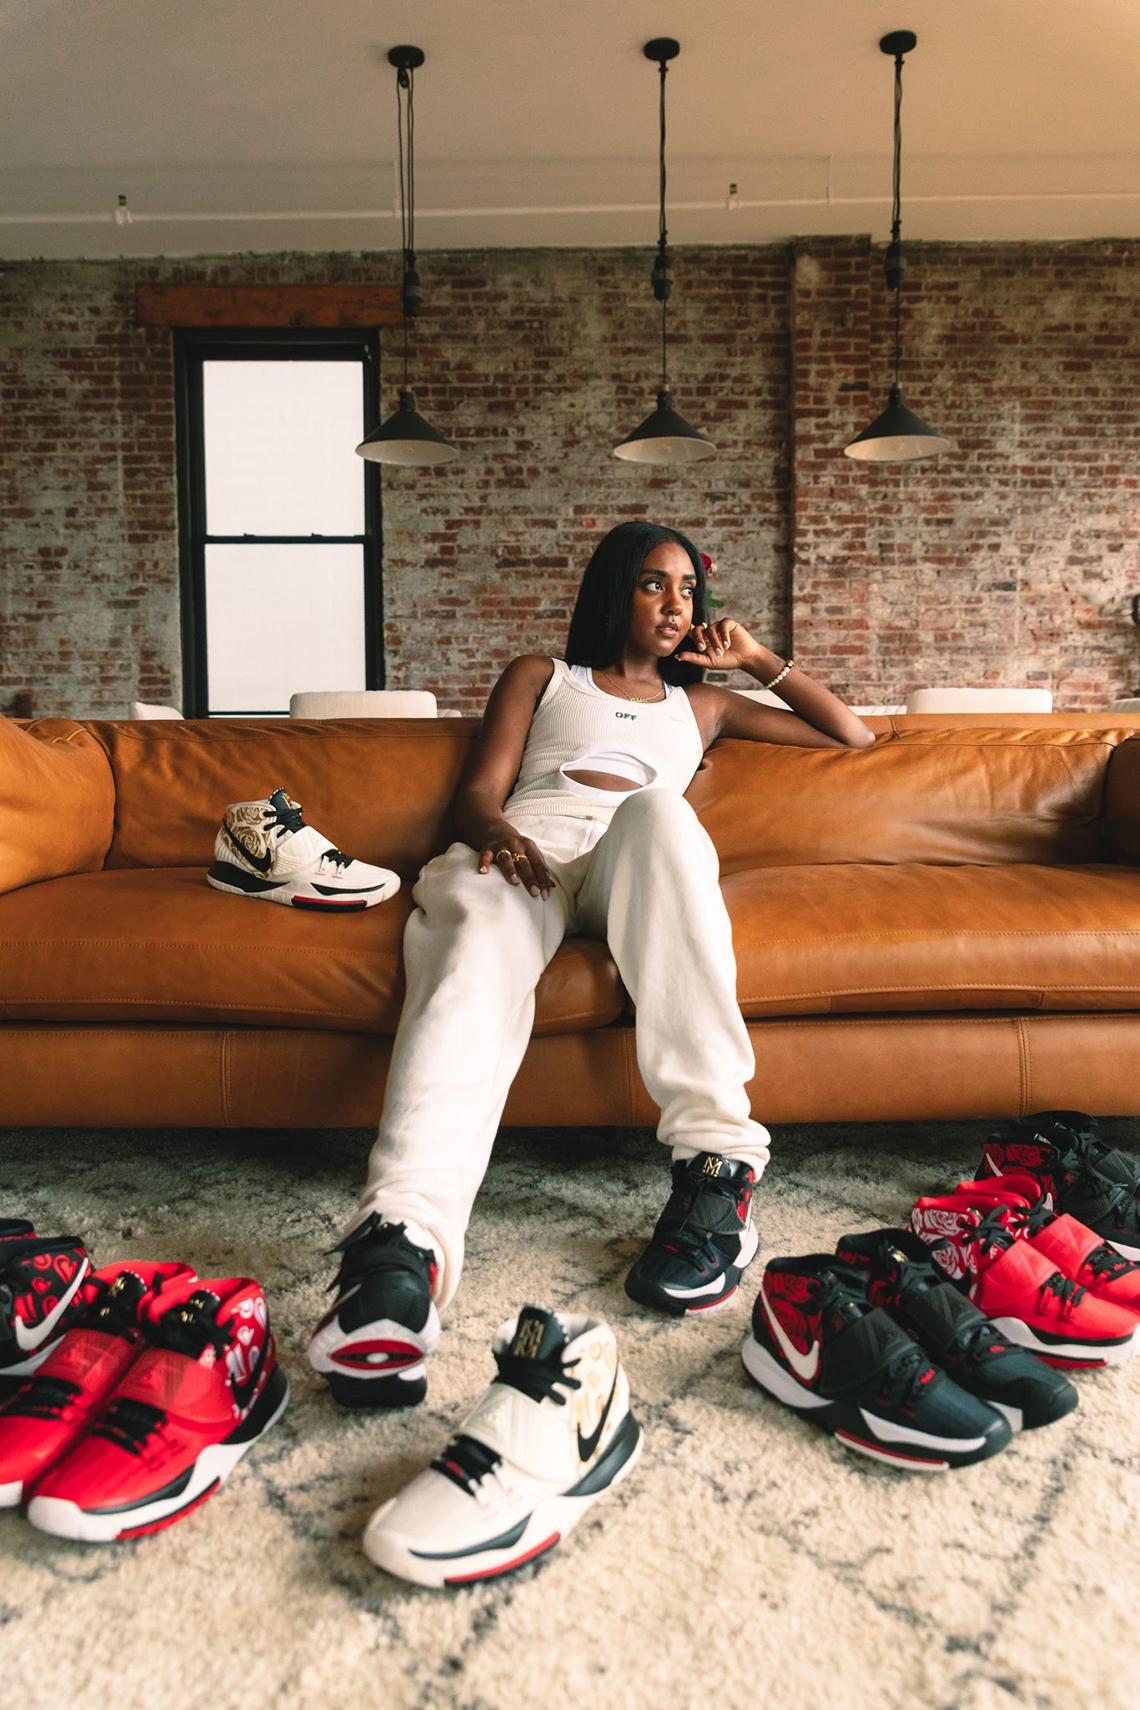 Sneaker Room Nike Kyrie 6 Mom スニーカー ルーム ナイキ コラボ 6 マム image model